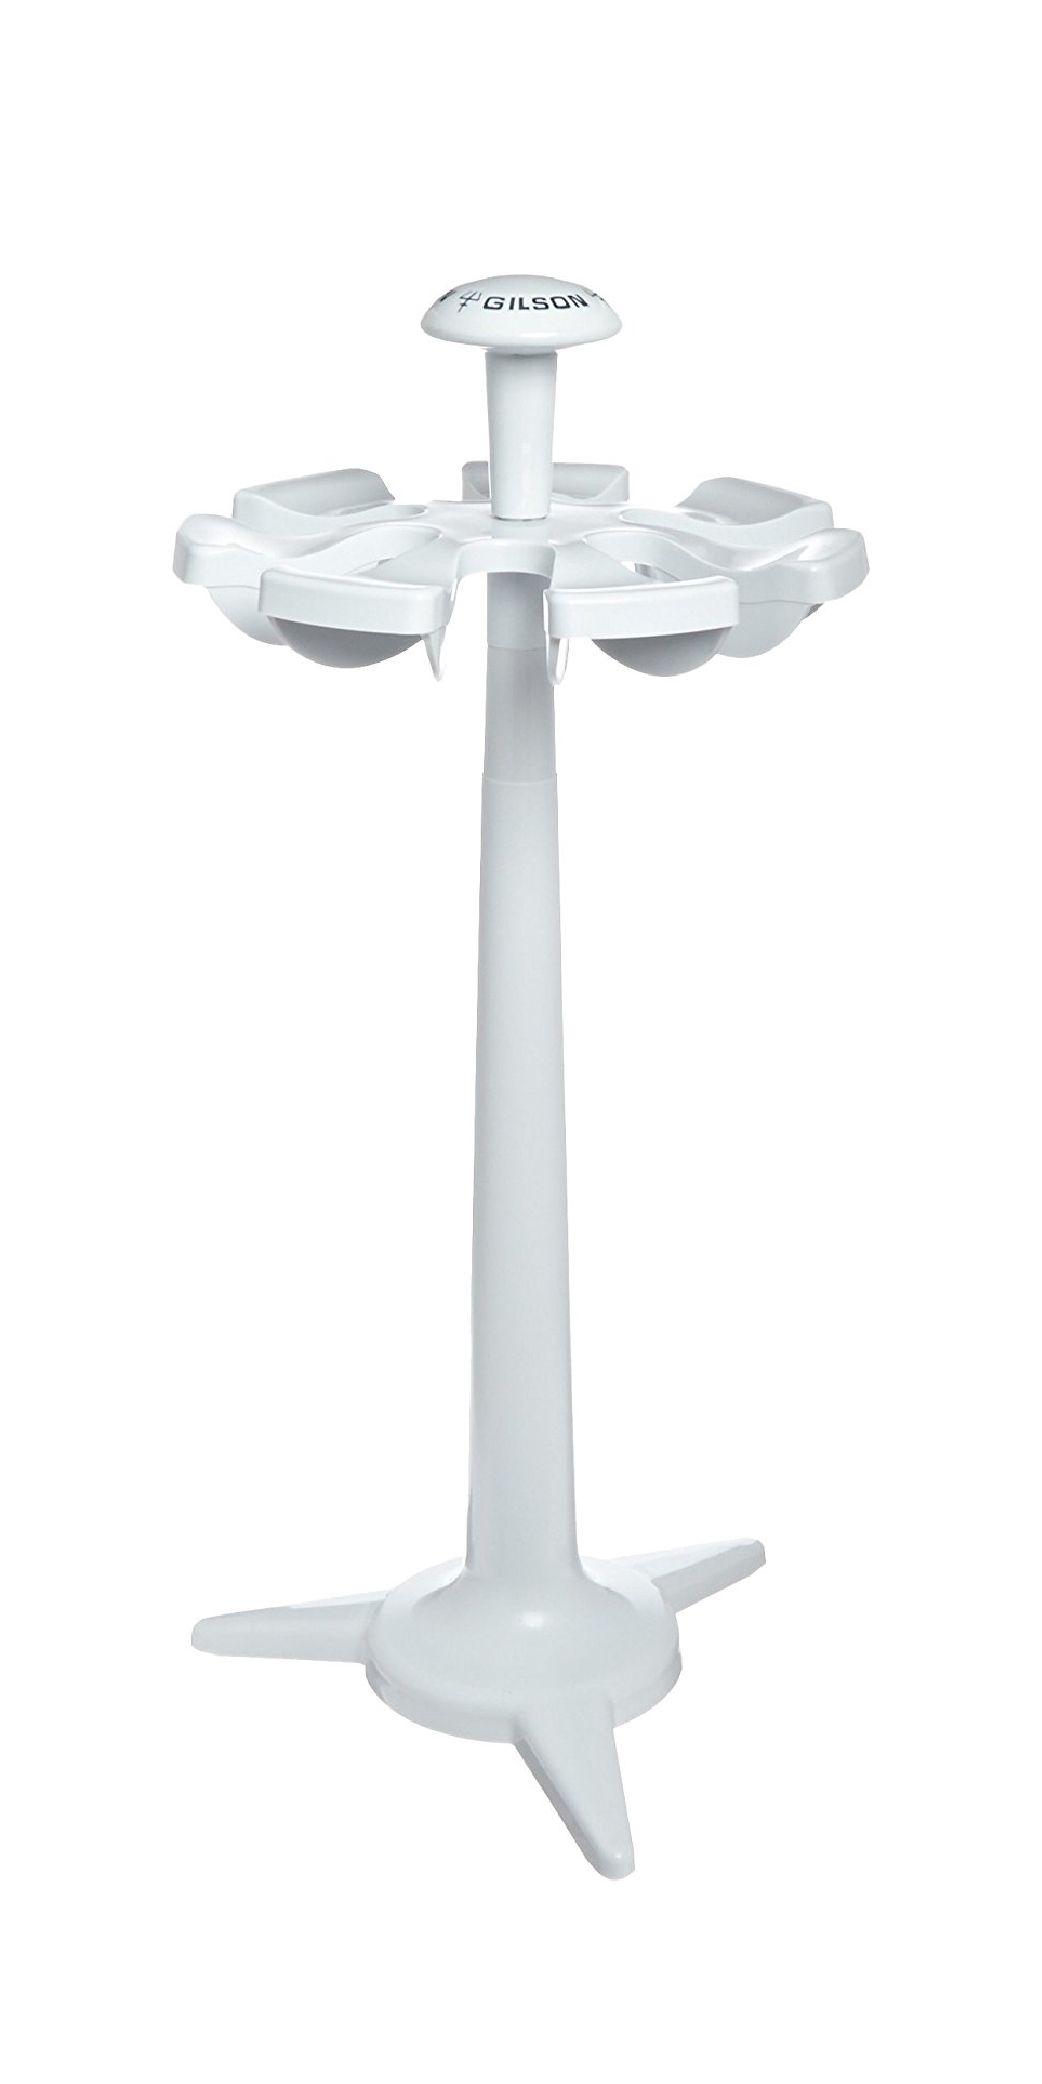 Pipetstandaard Carrousel™ voor 7 Gilson pipetten (13361401)